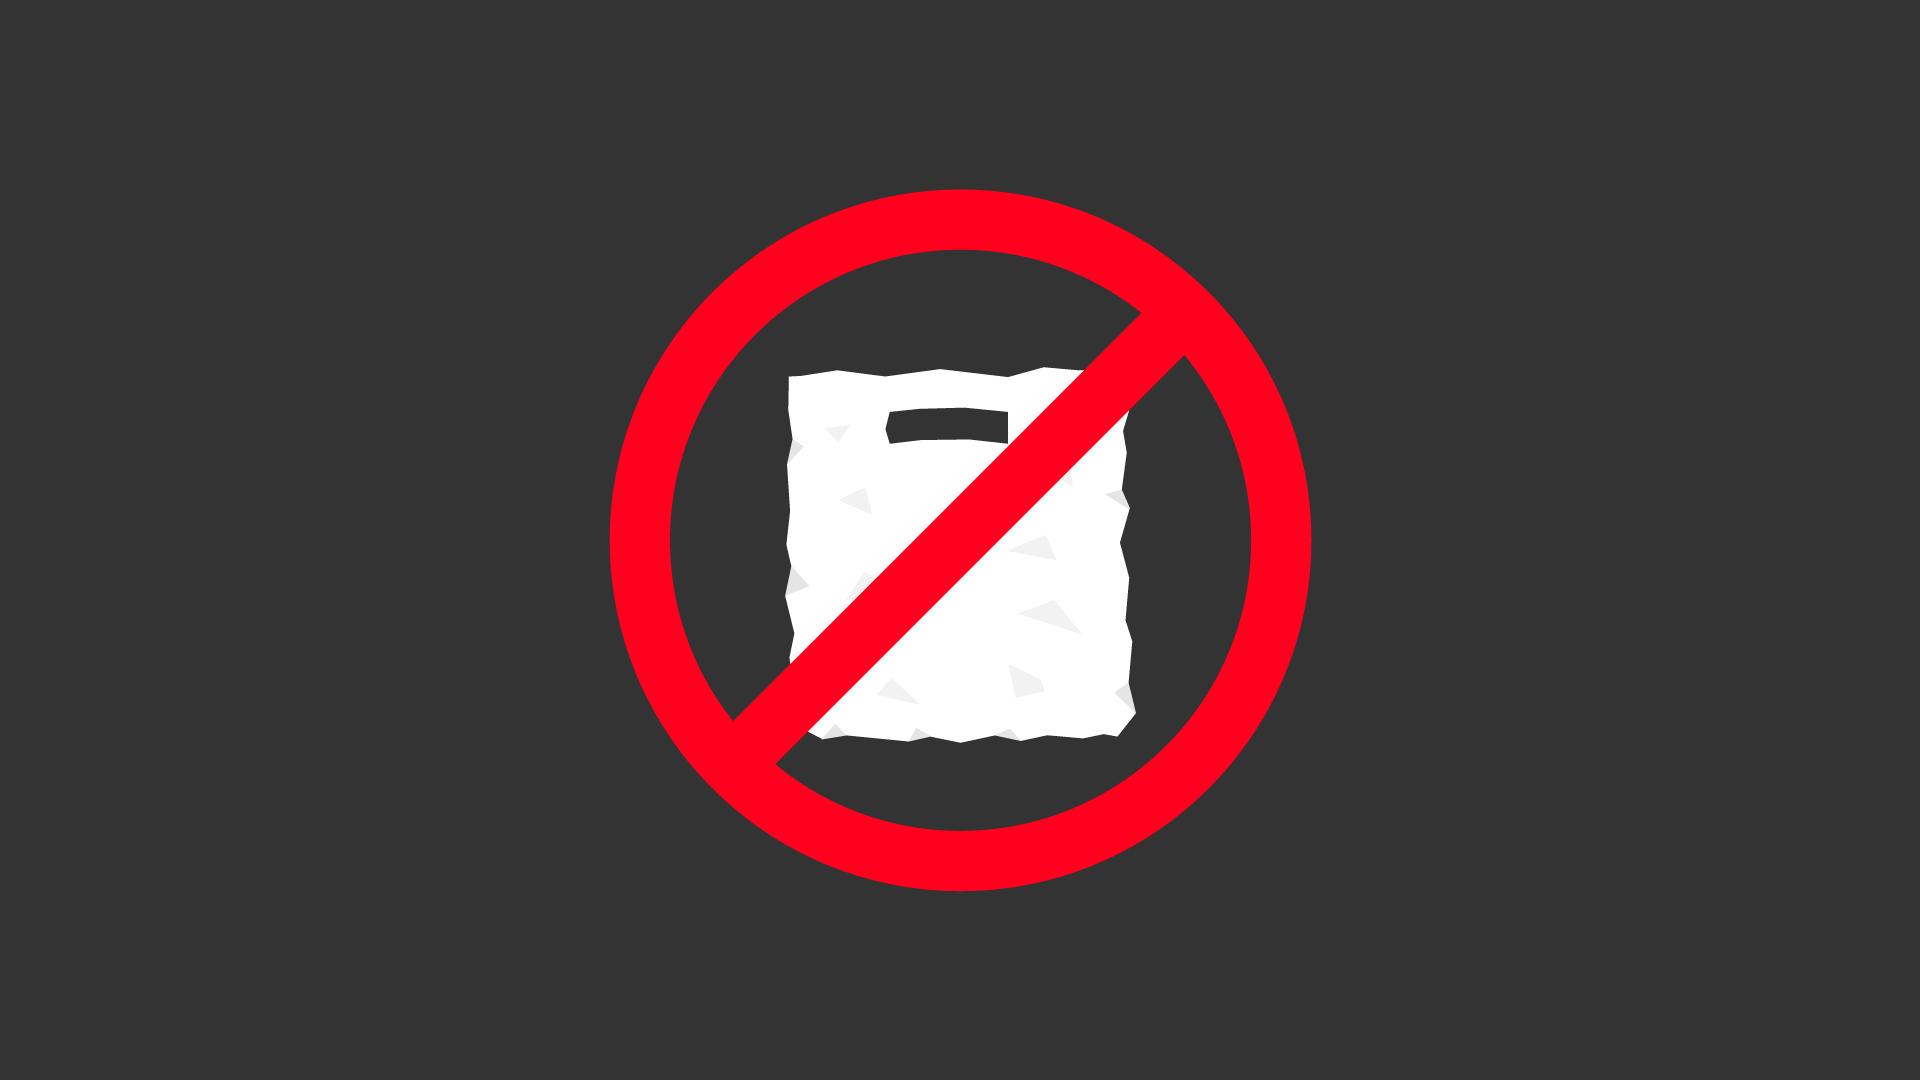 plastpose-forbud.png